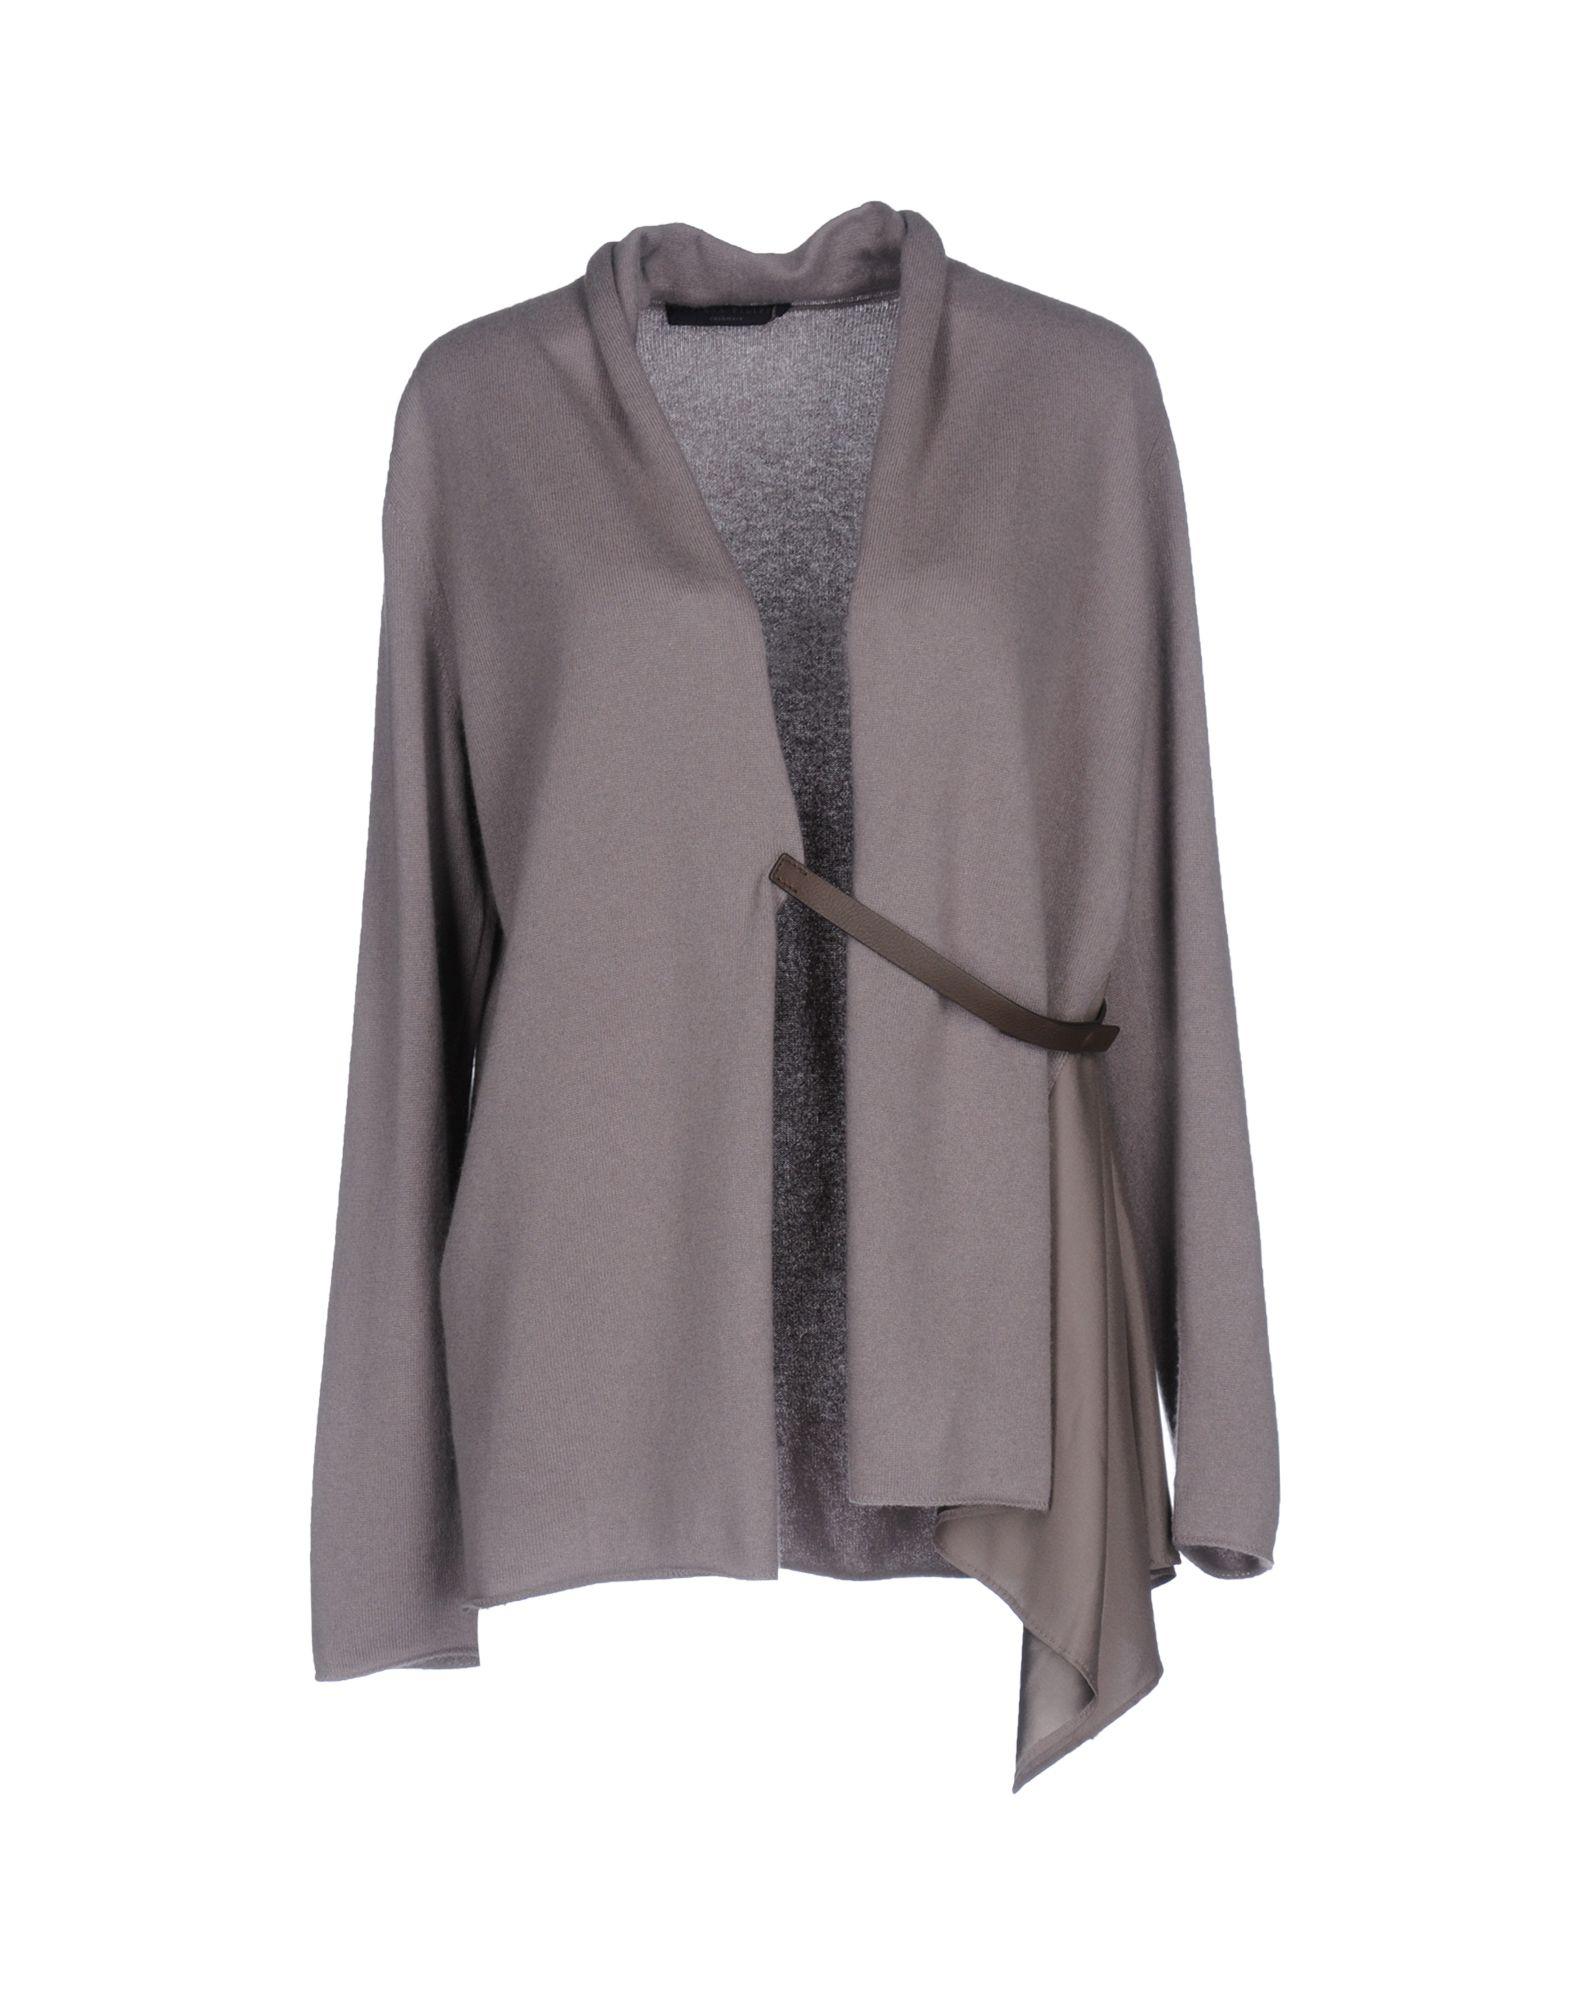 FABIANA FILIPPI Damen Strickjacke Farbe Grau Größe 5